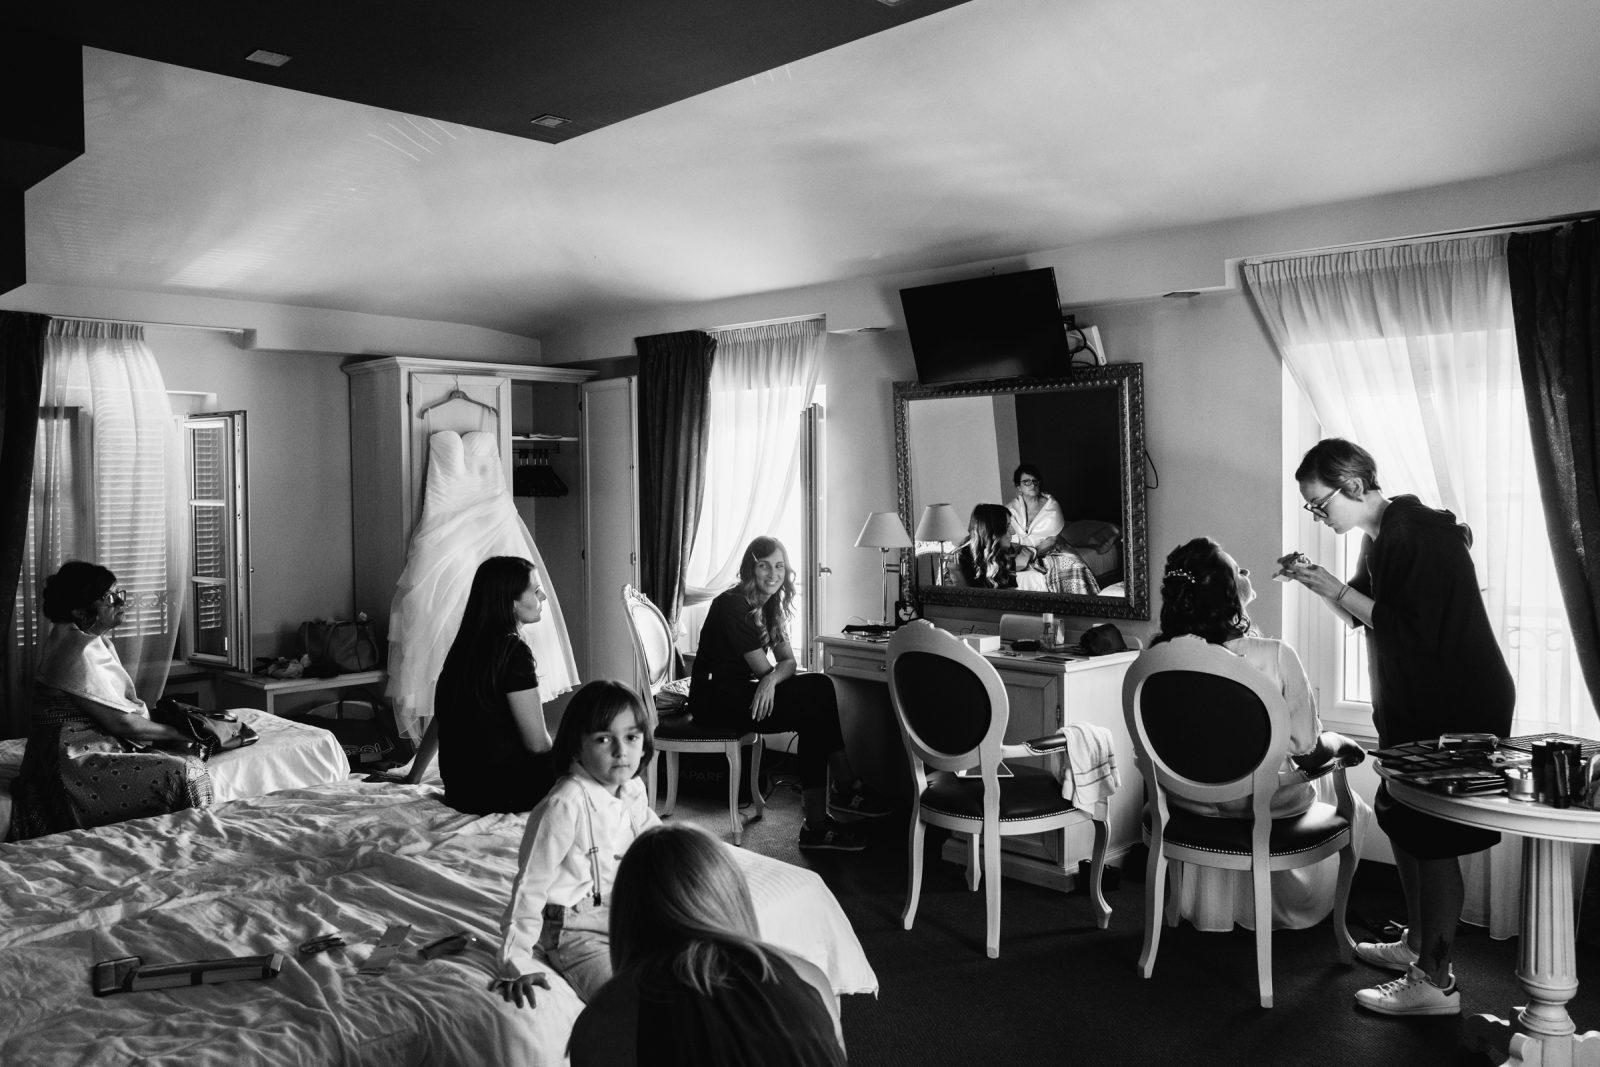 Fotografo matrimonio lago d'iseo wedding reportage. Max Allegritti